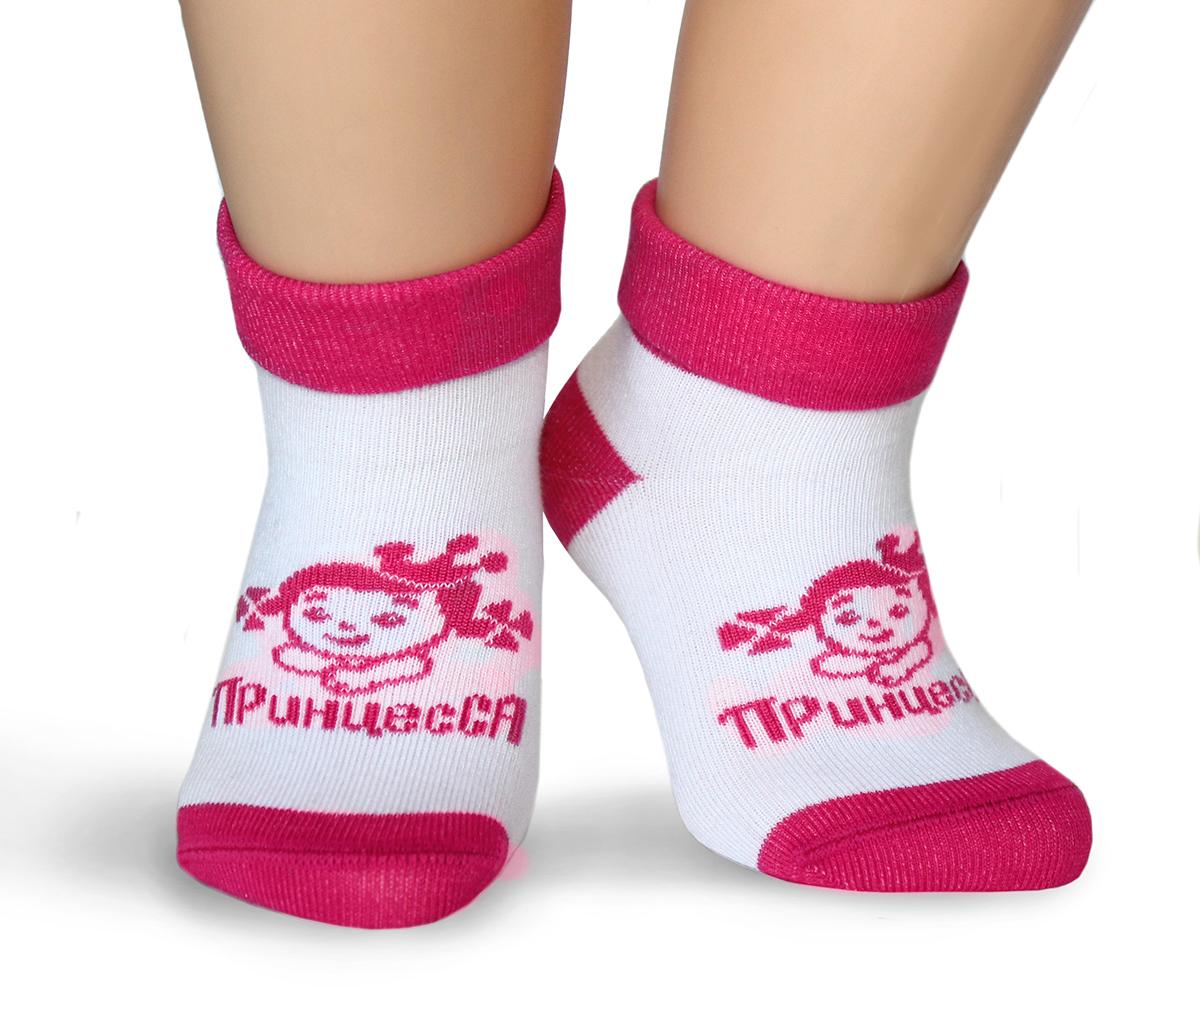 Носки для девочки Touch Gold, цвет: розовый. 129. Размер 20/22 кроссовки для девочки zenden цвет розовый 219 33gg 002tt размер 31